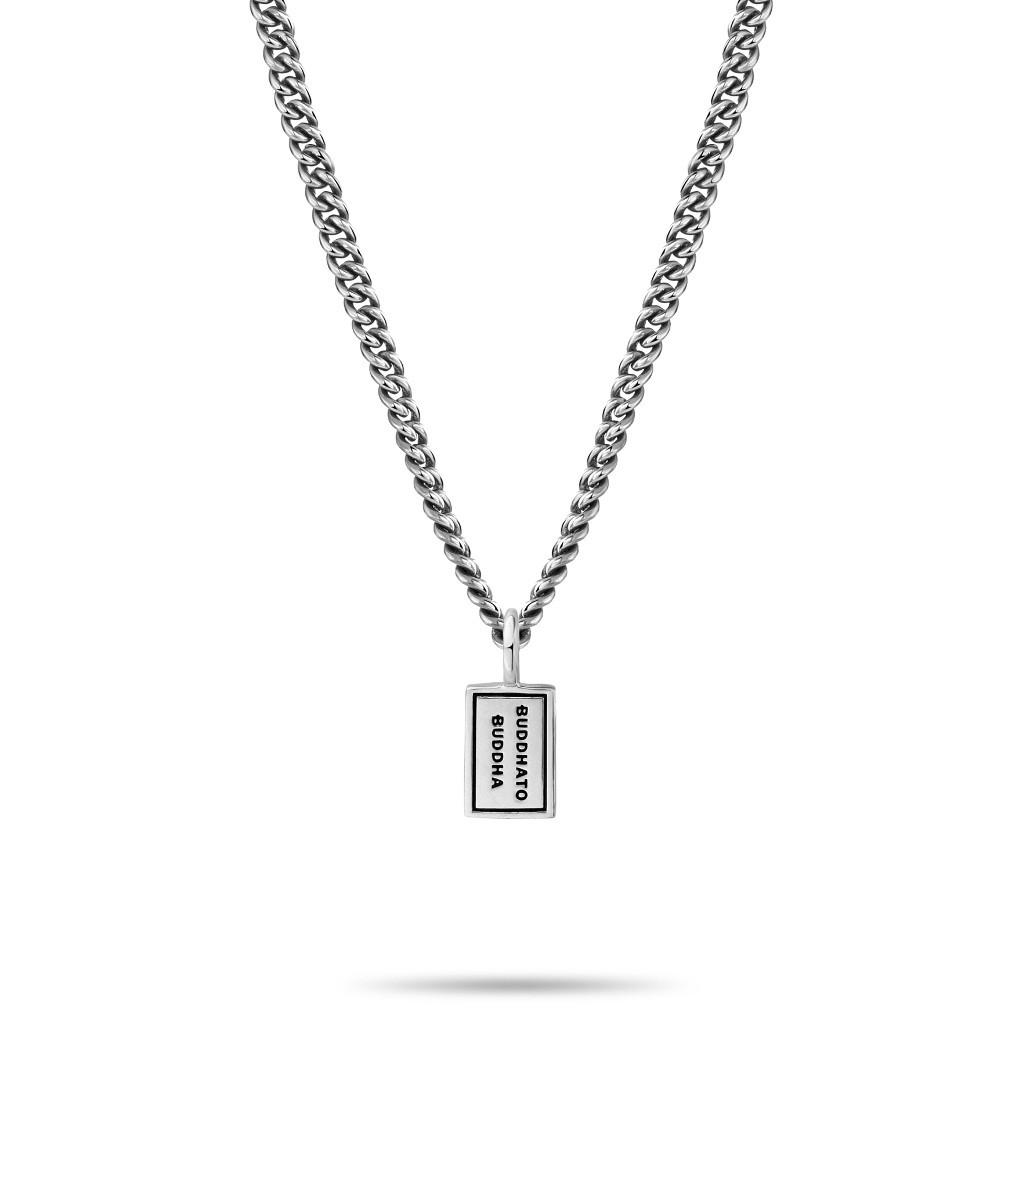 Collier Essential L 671